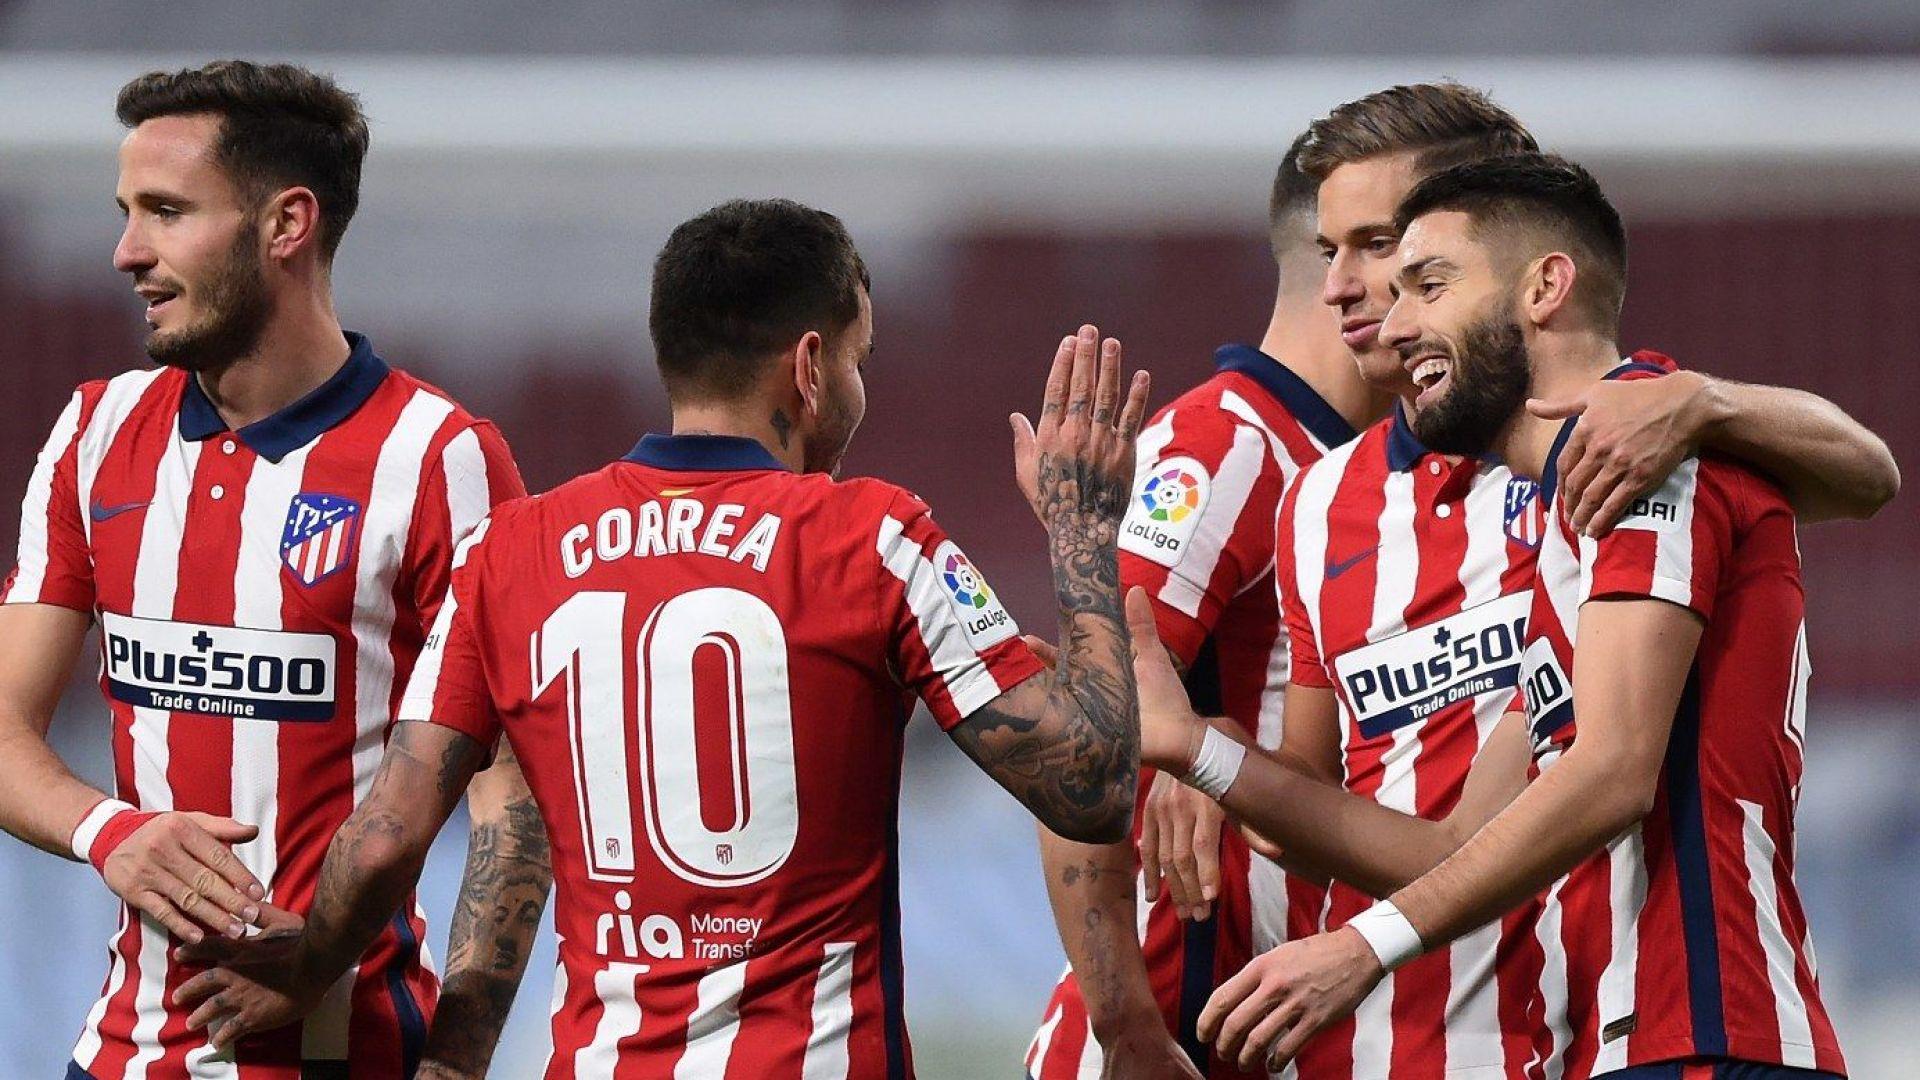 Реал затвори годината си с провал, вечерта принадлежи на Суарес и Атлетико